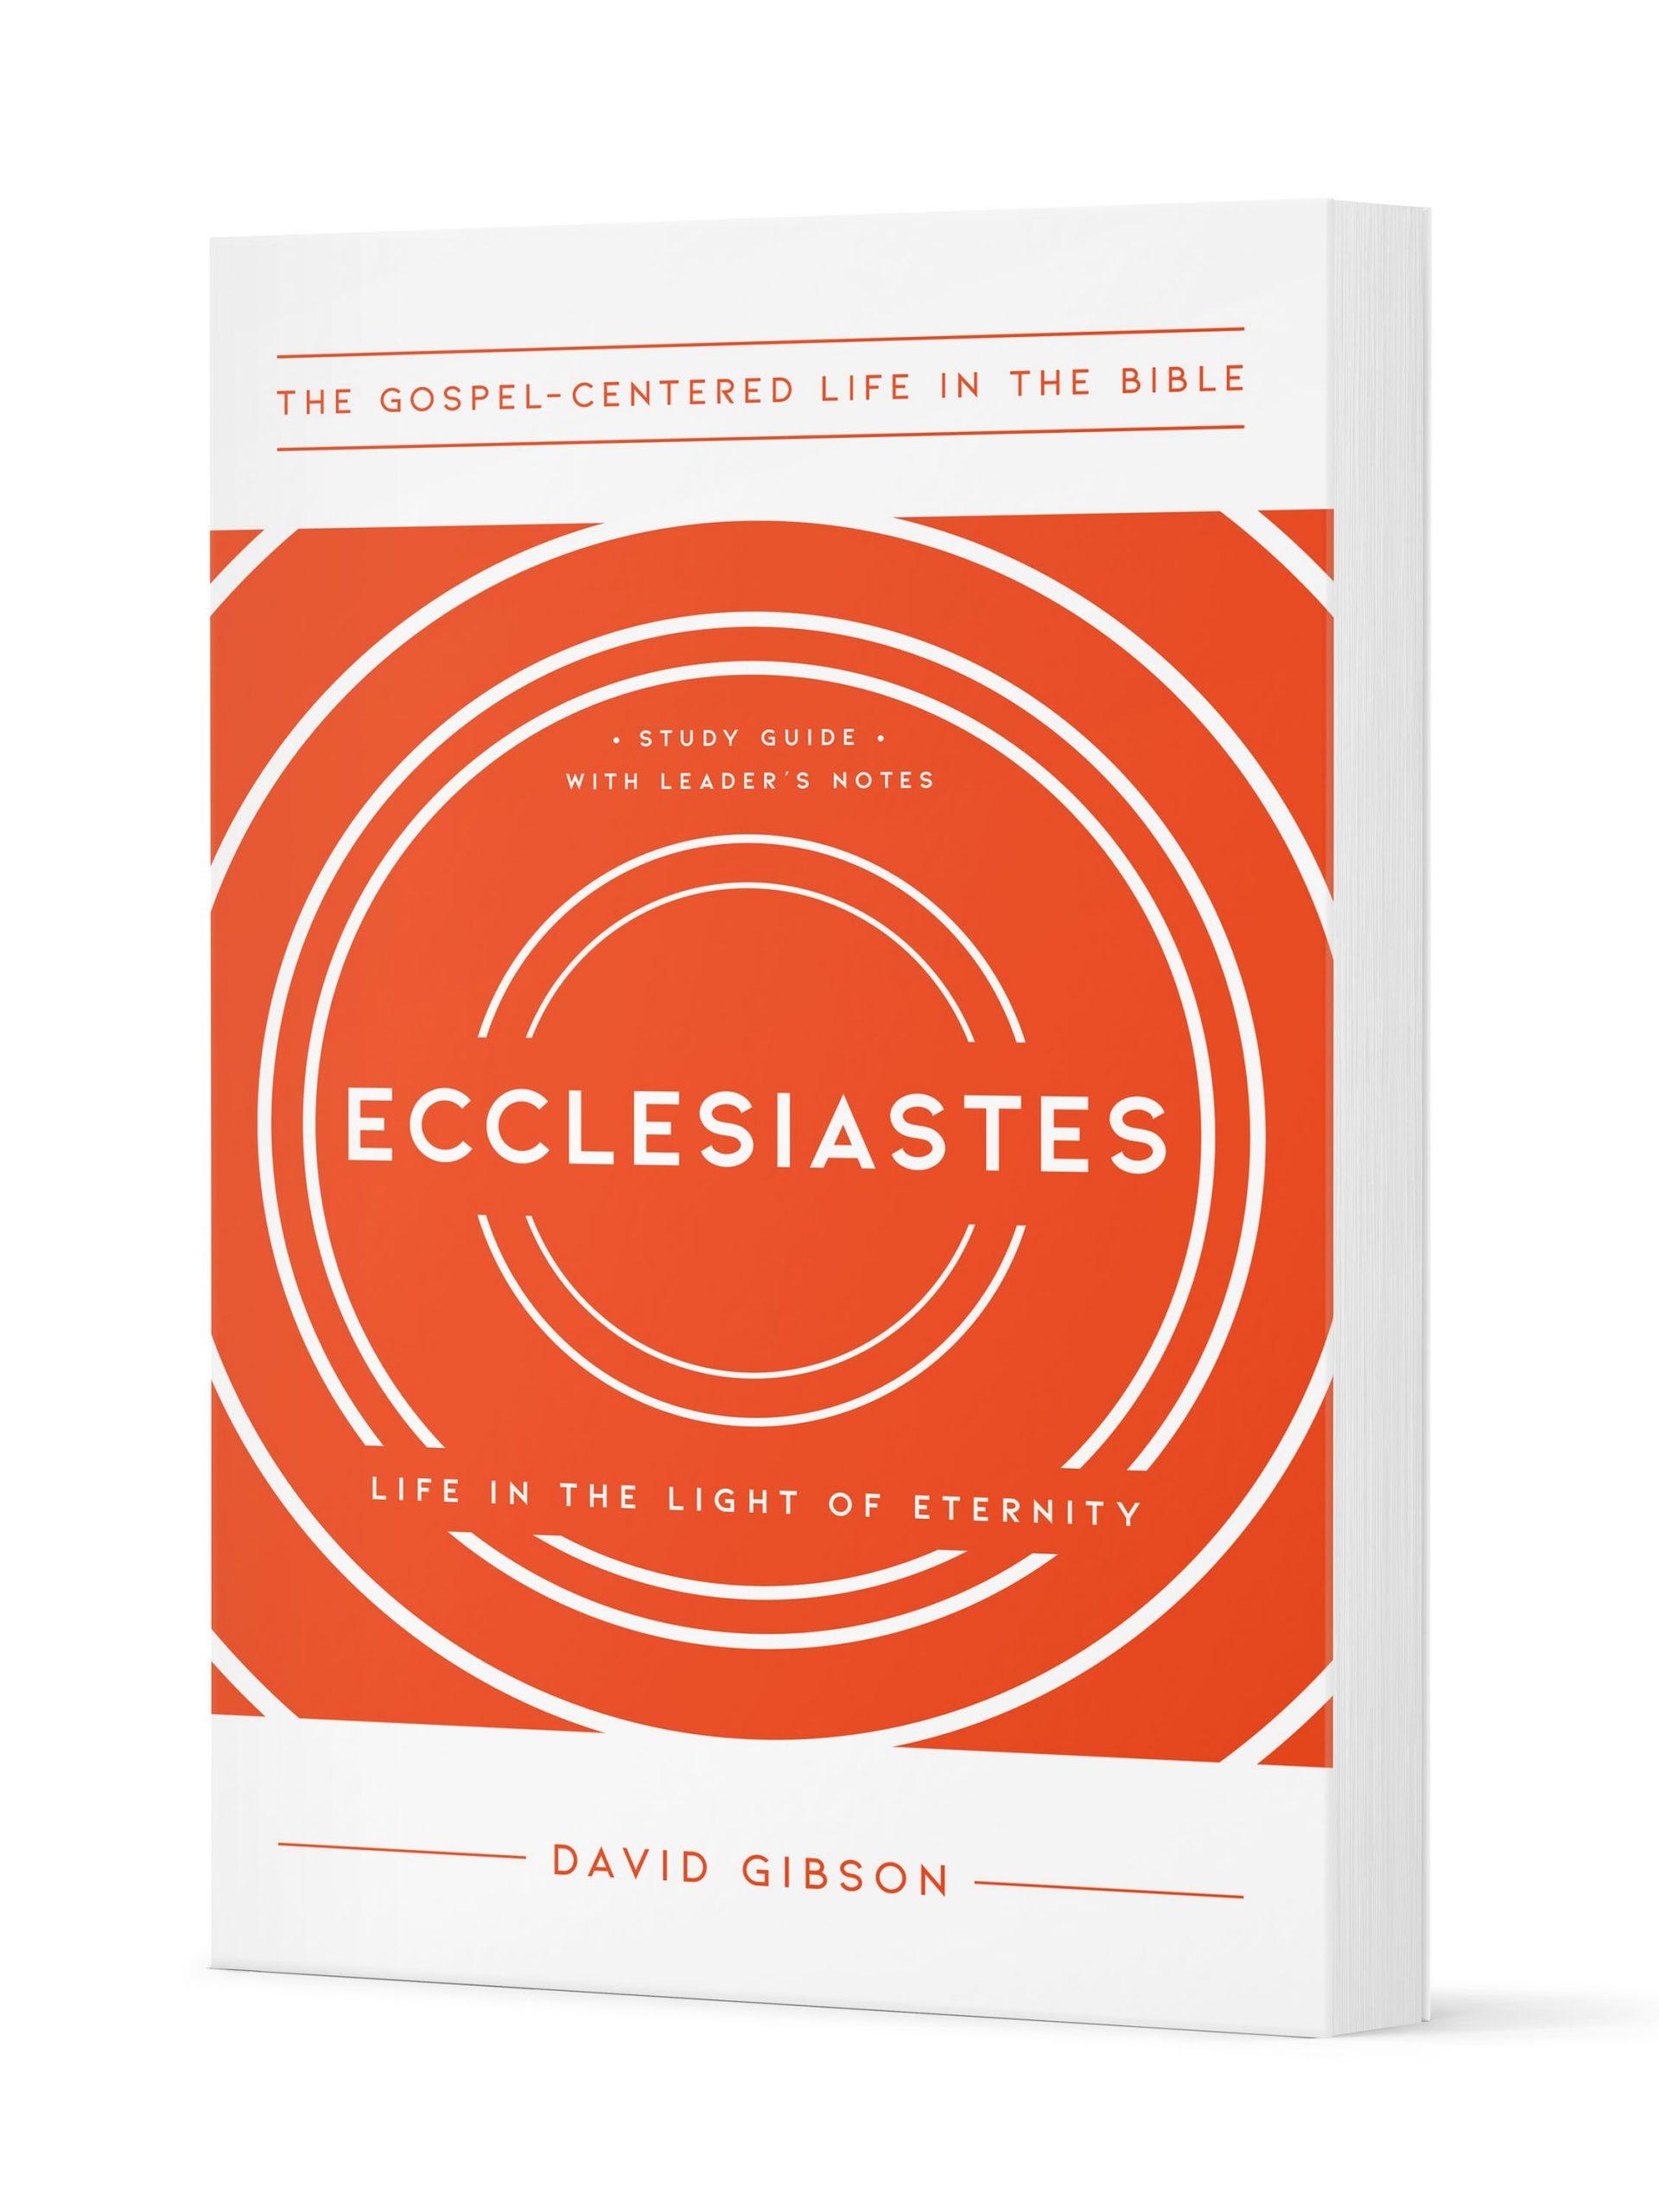 Ecclesiastes mockup